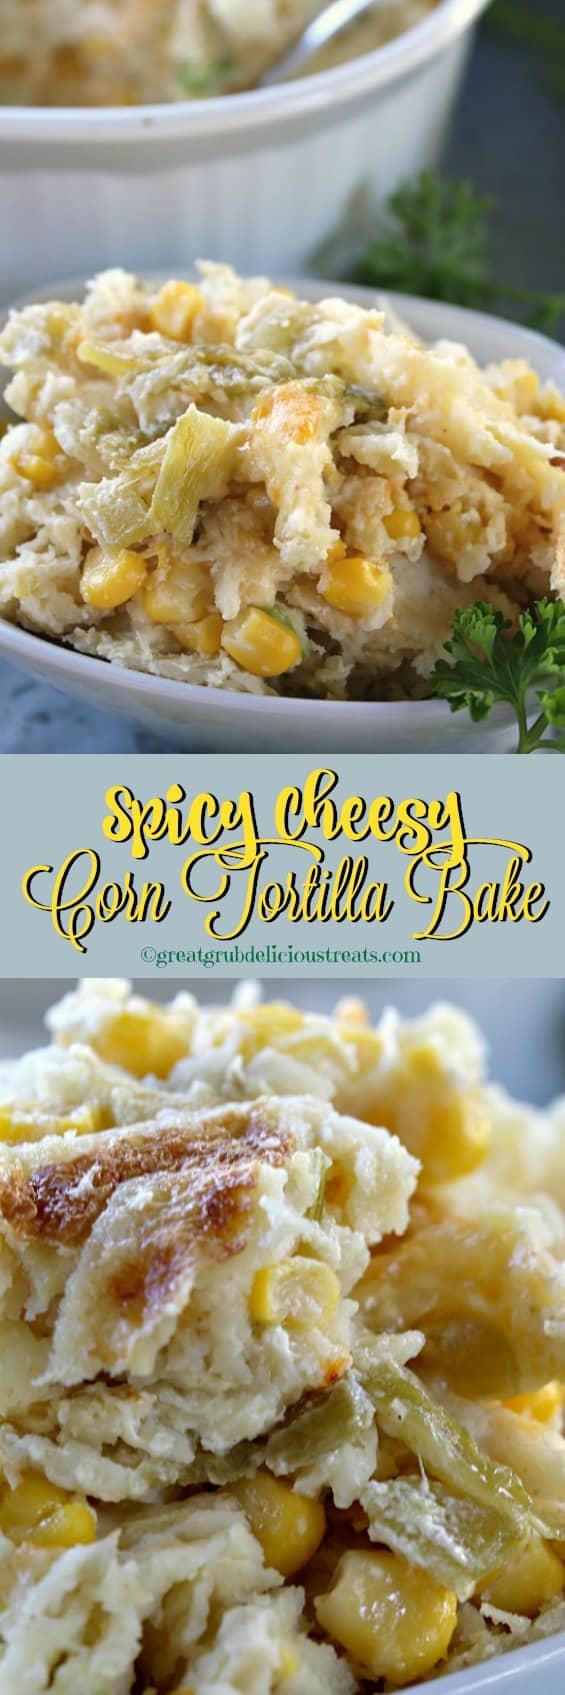 Spicy Cheesy Corn Tortilla Bake